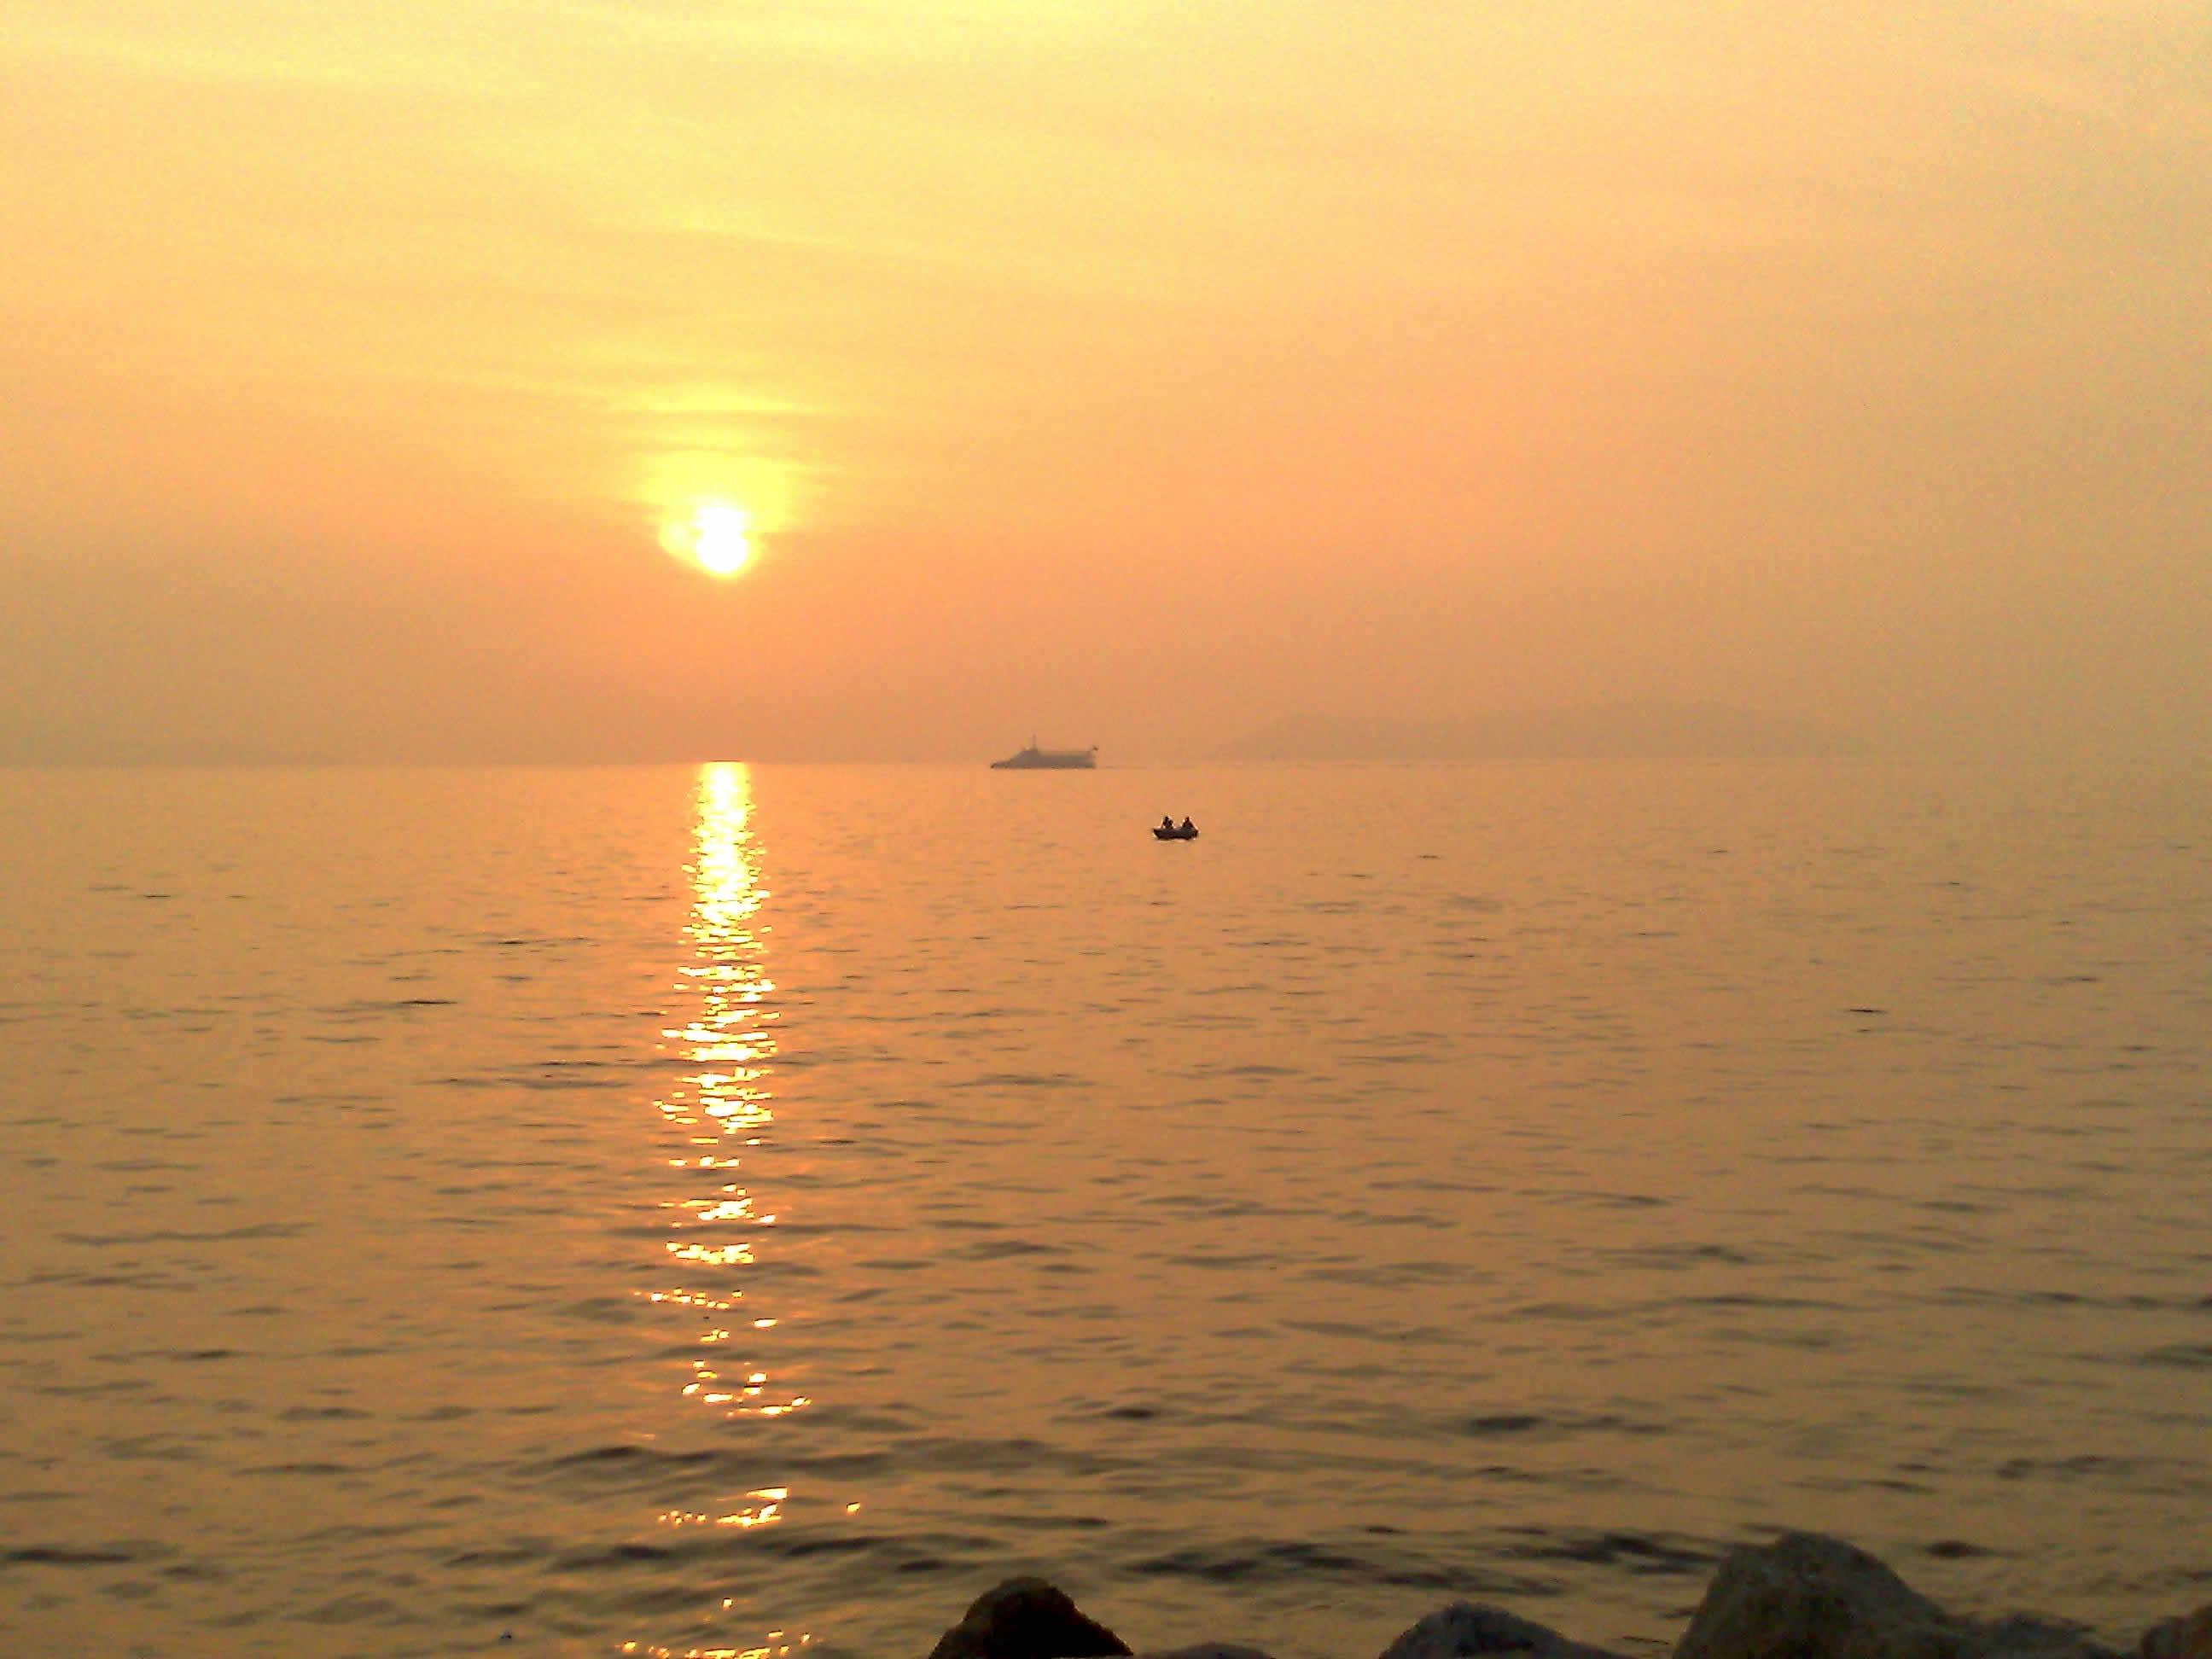 adalarda güneşin batışı